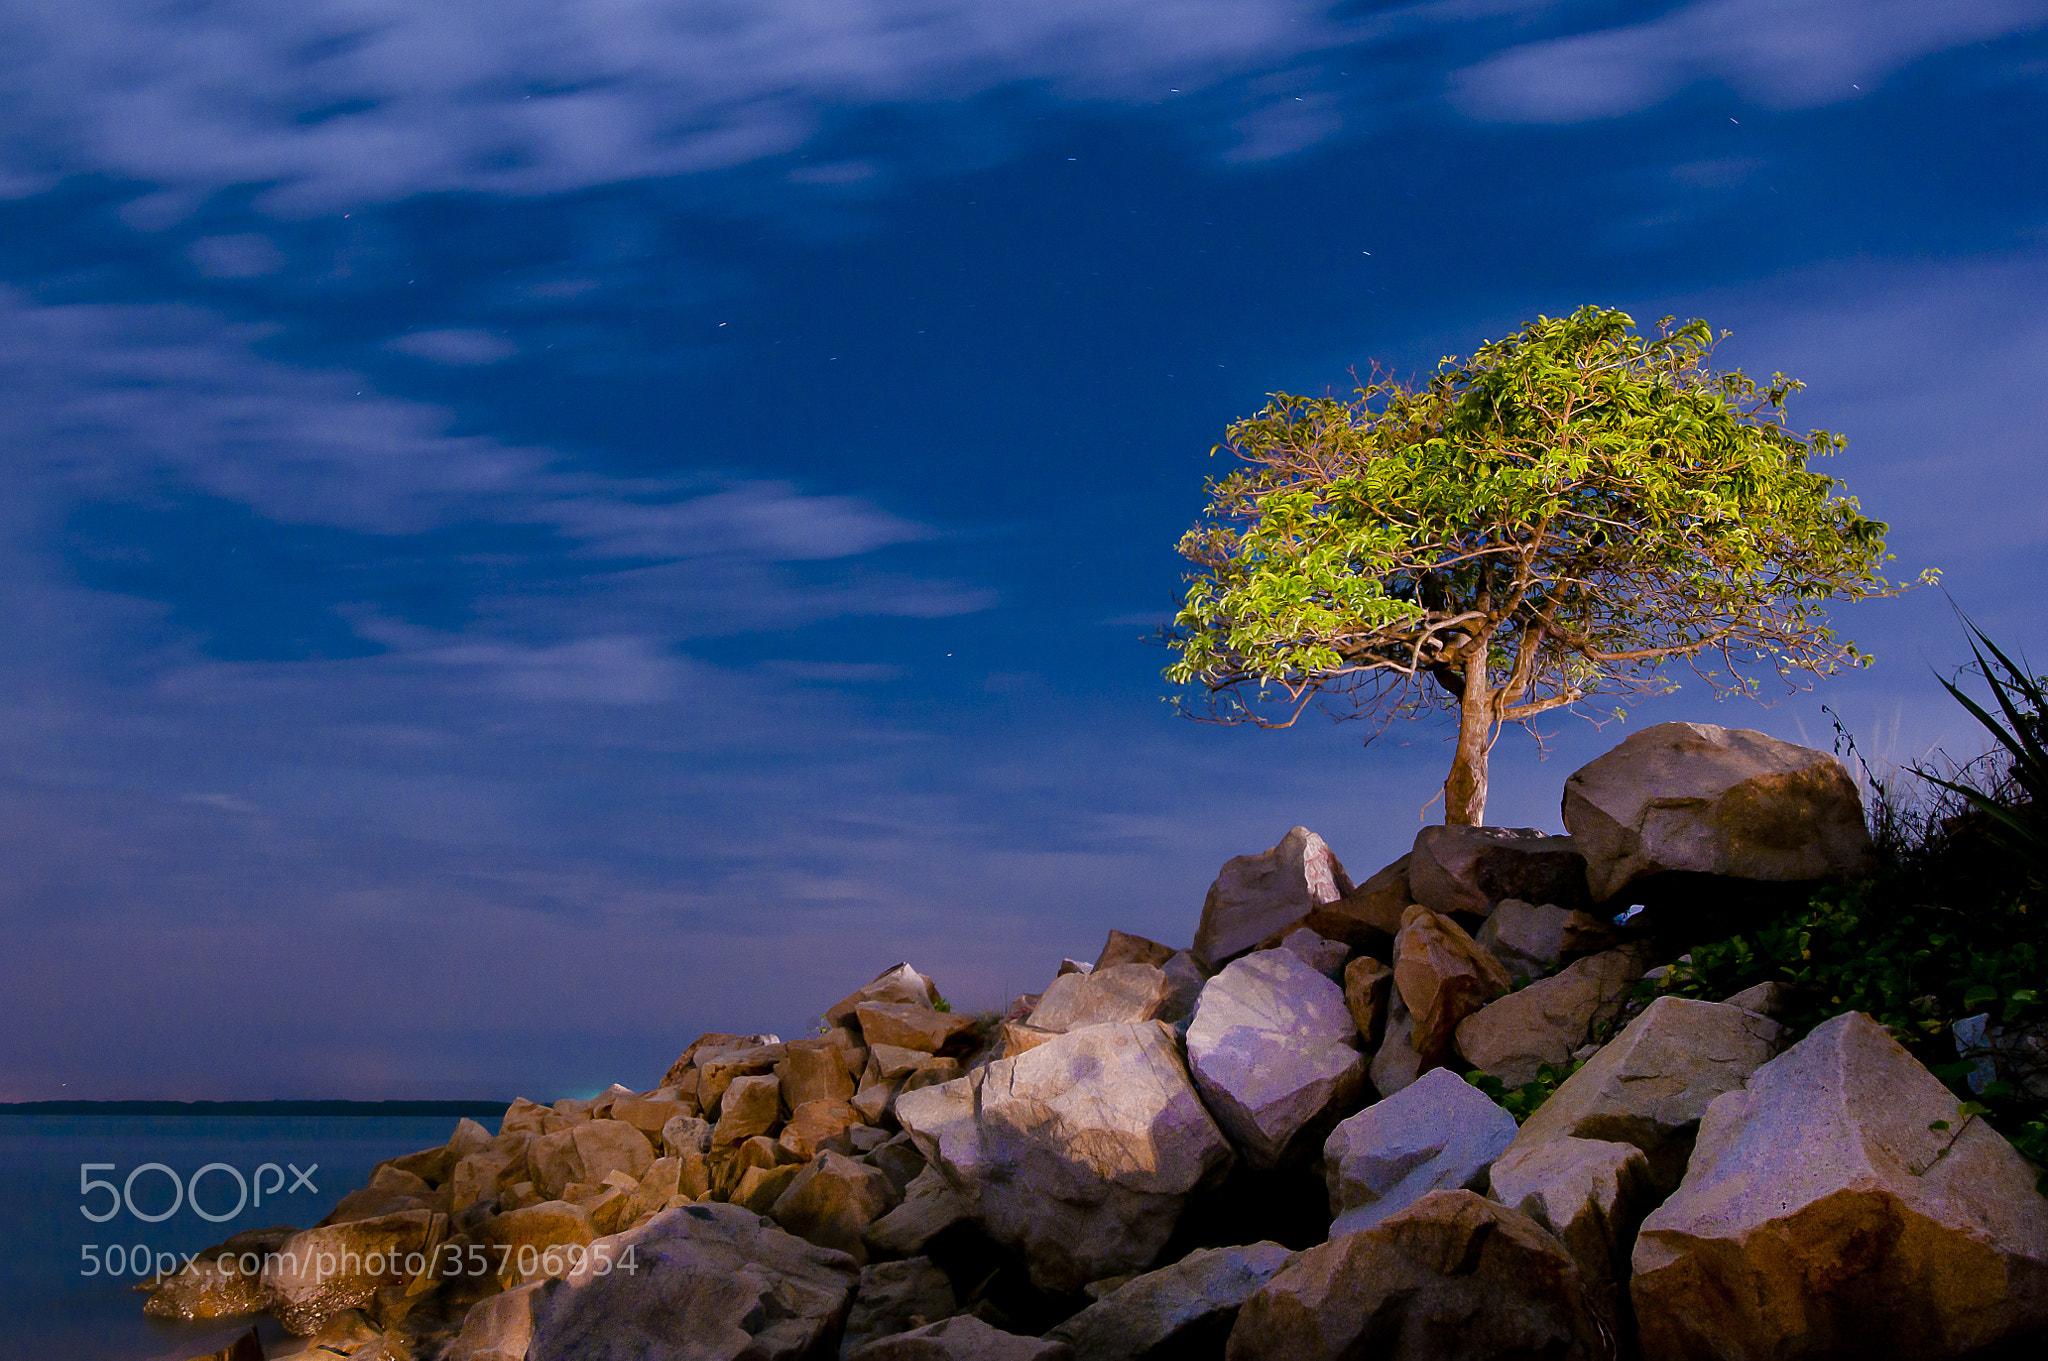 Photograph A Lonely Tree by mradz radz on 500px